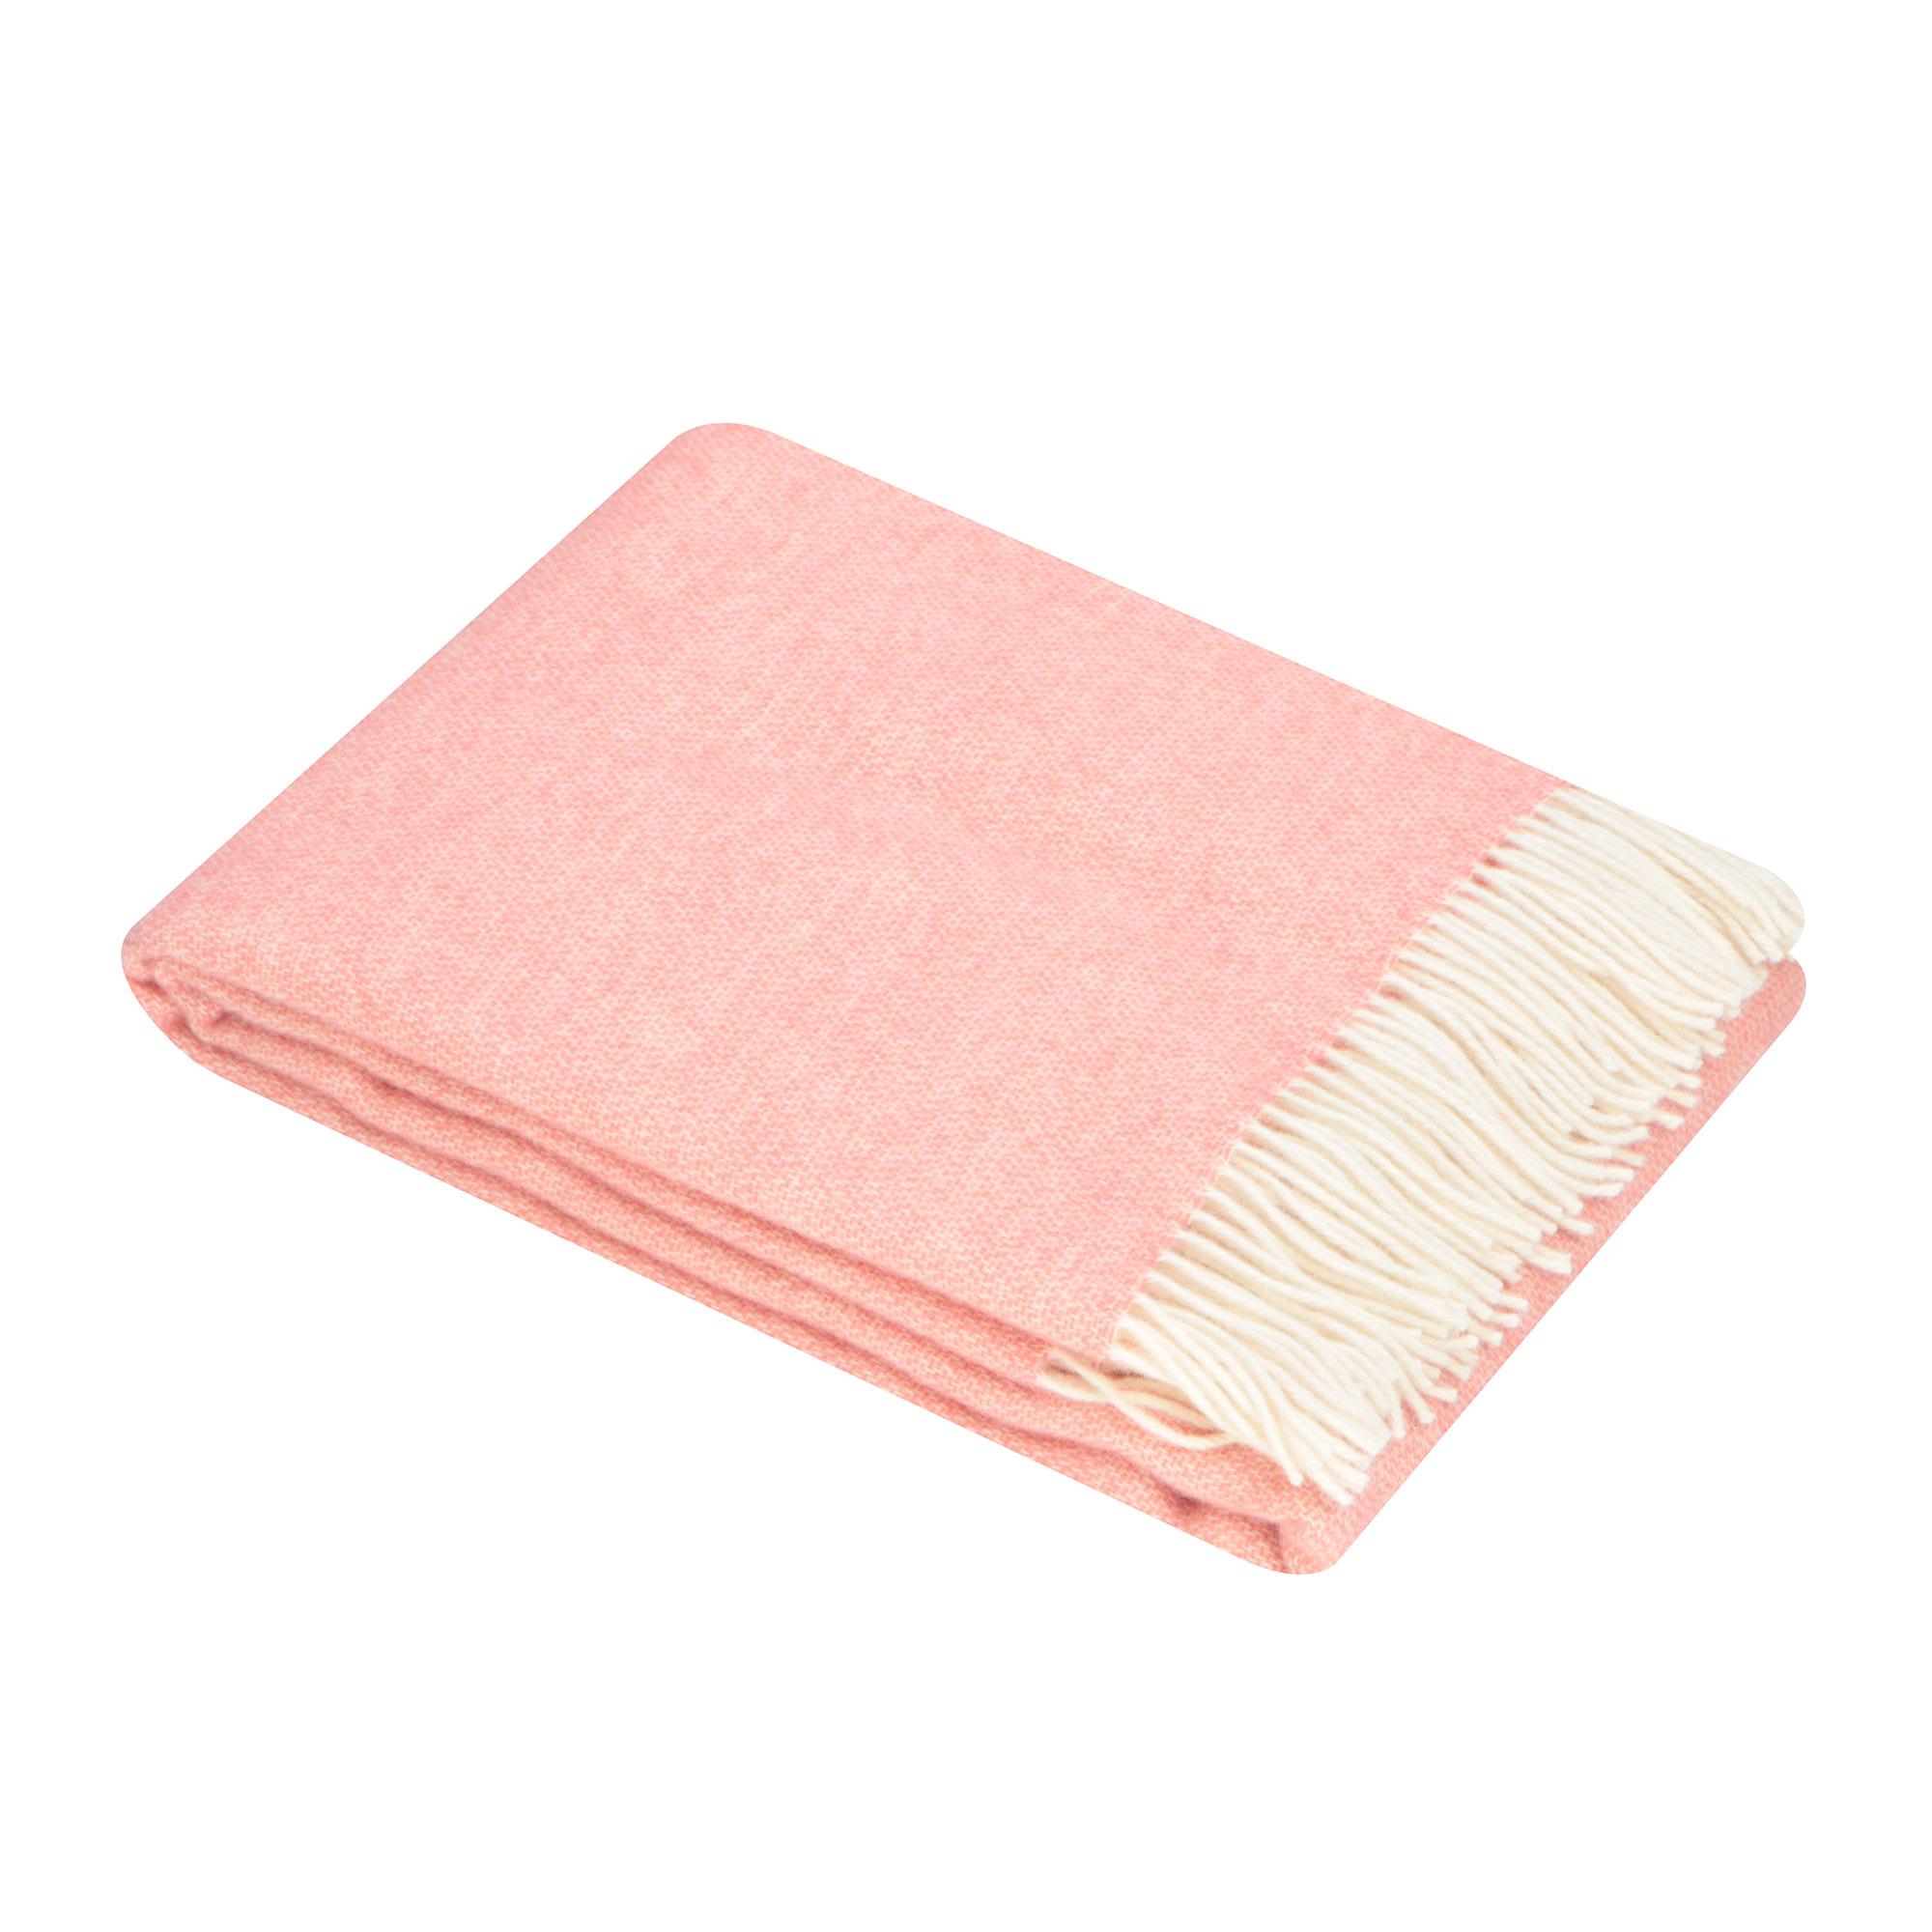 Плед Home Blanket Alisabetta розовый с белым 140х200 см